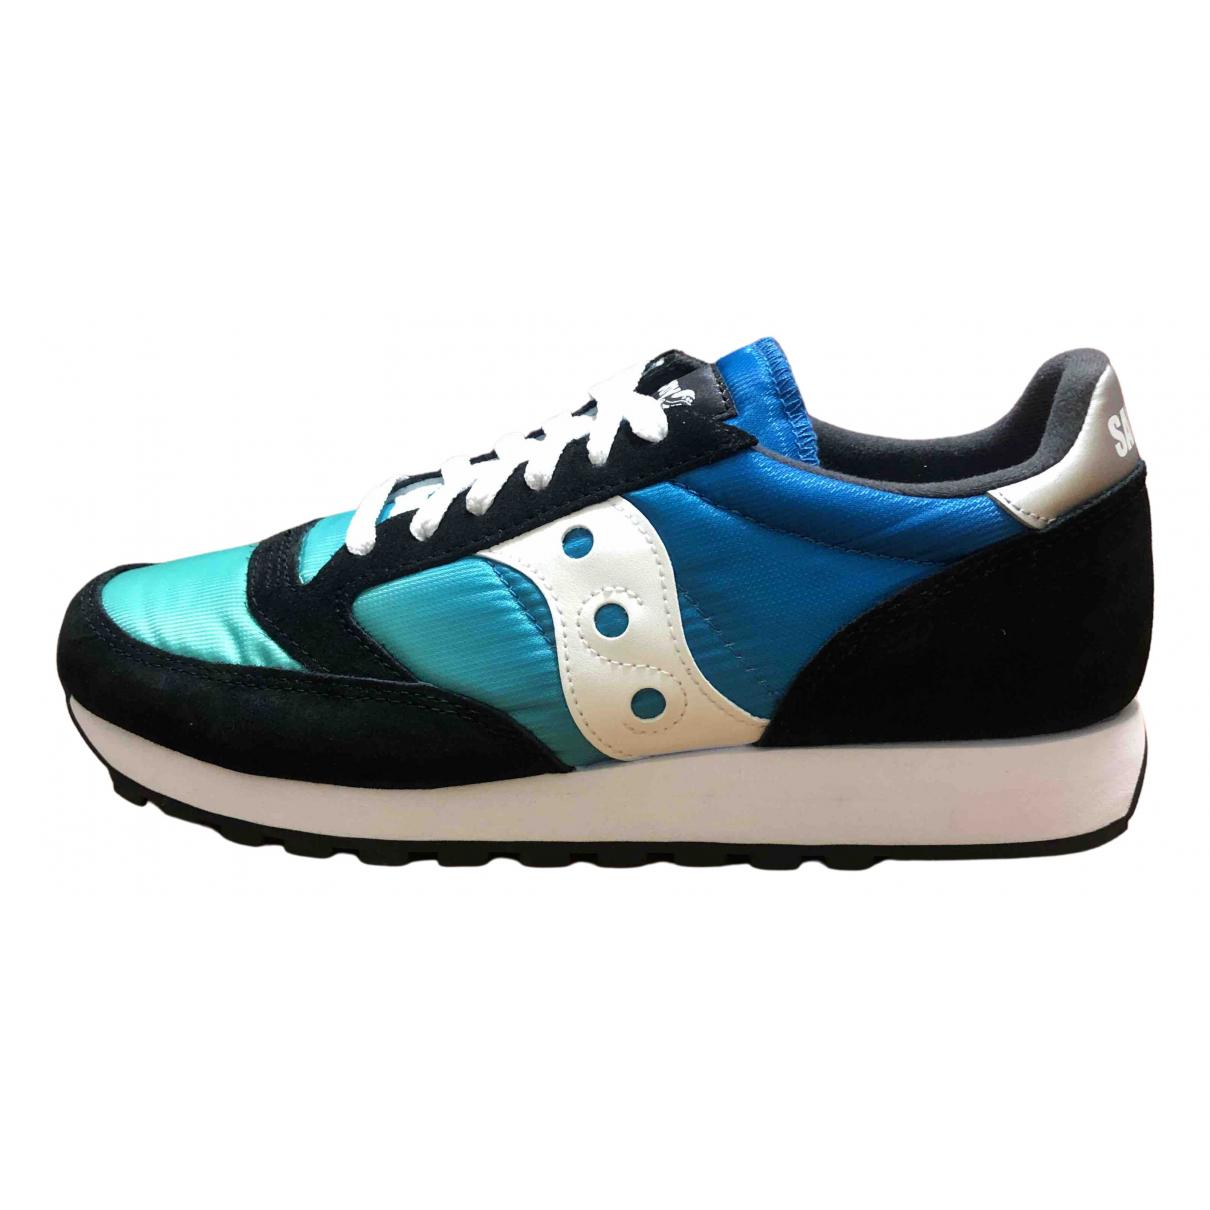 Saucony \N Sneakers in  Schwarz Veloursleder